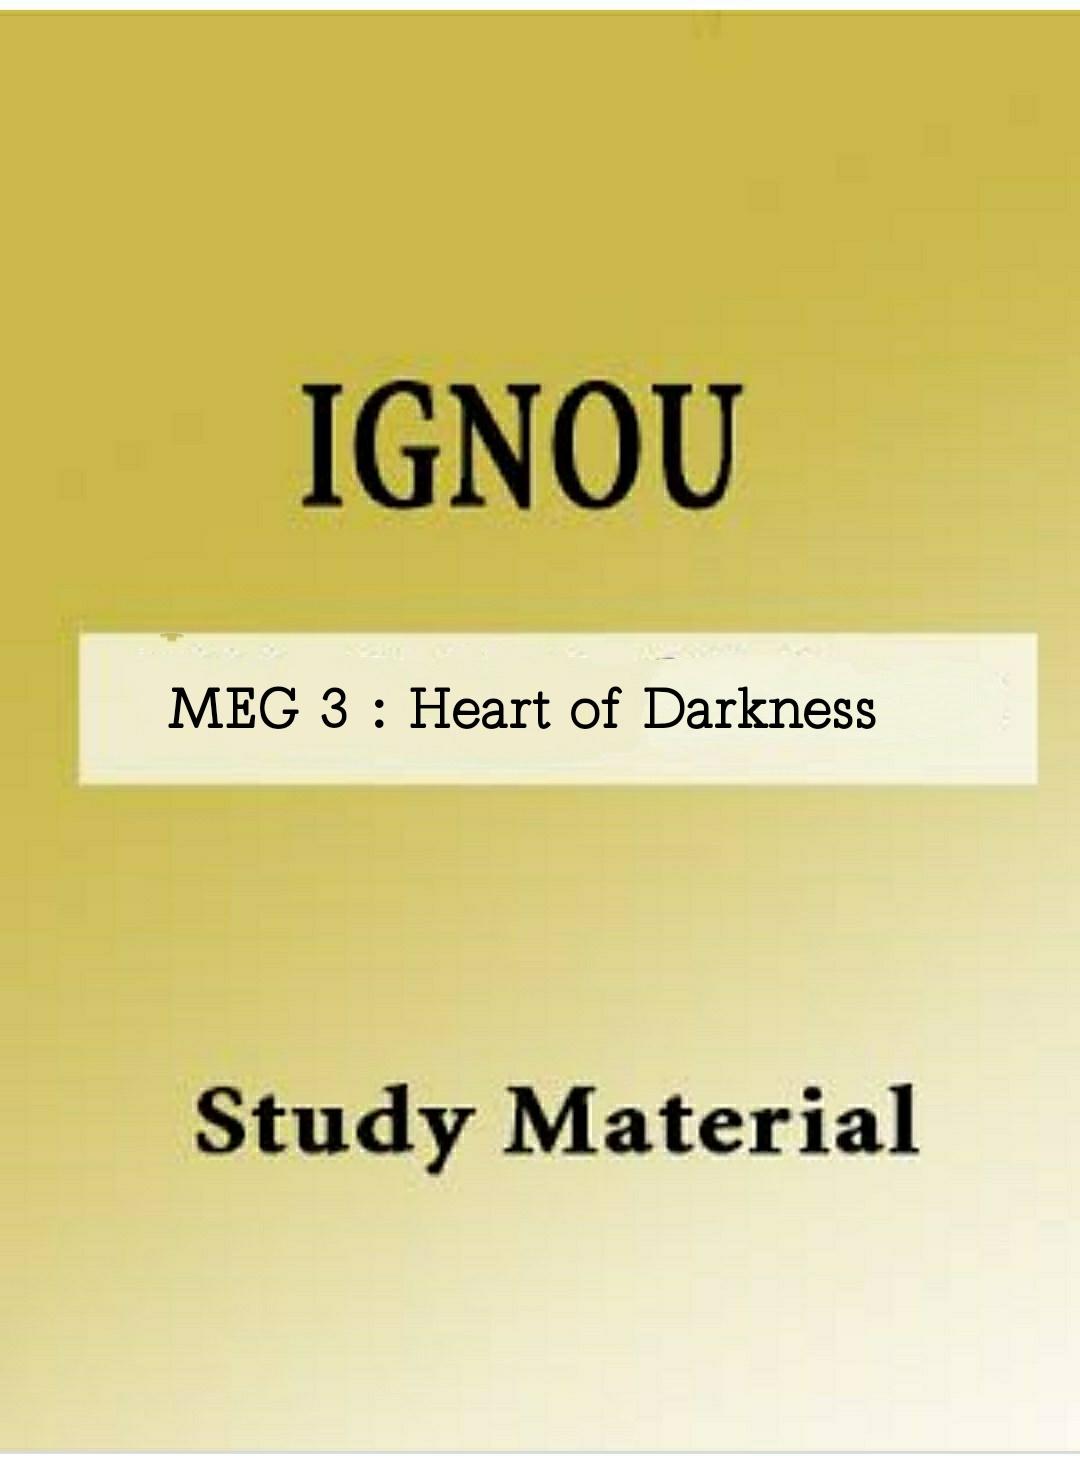 MEG : 3 British Novels : Heart of Darkness